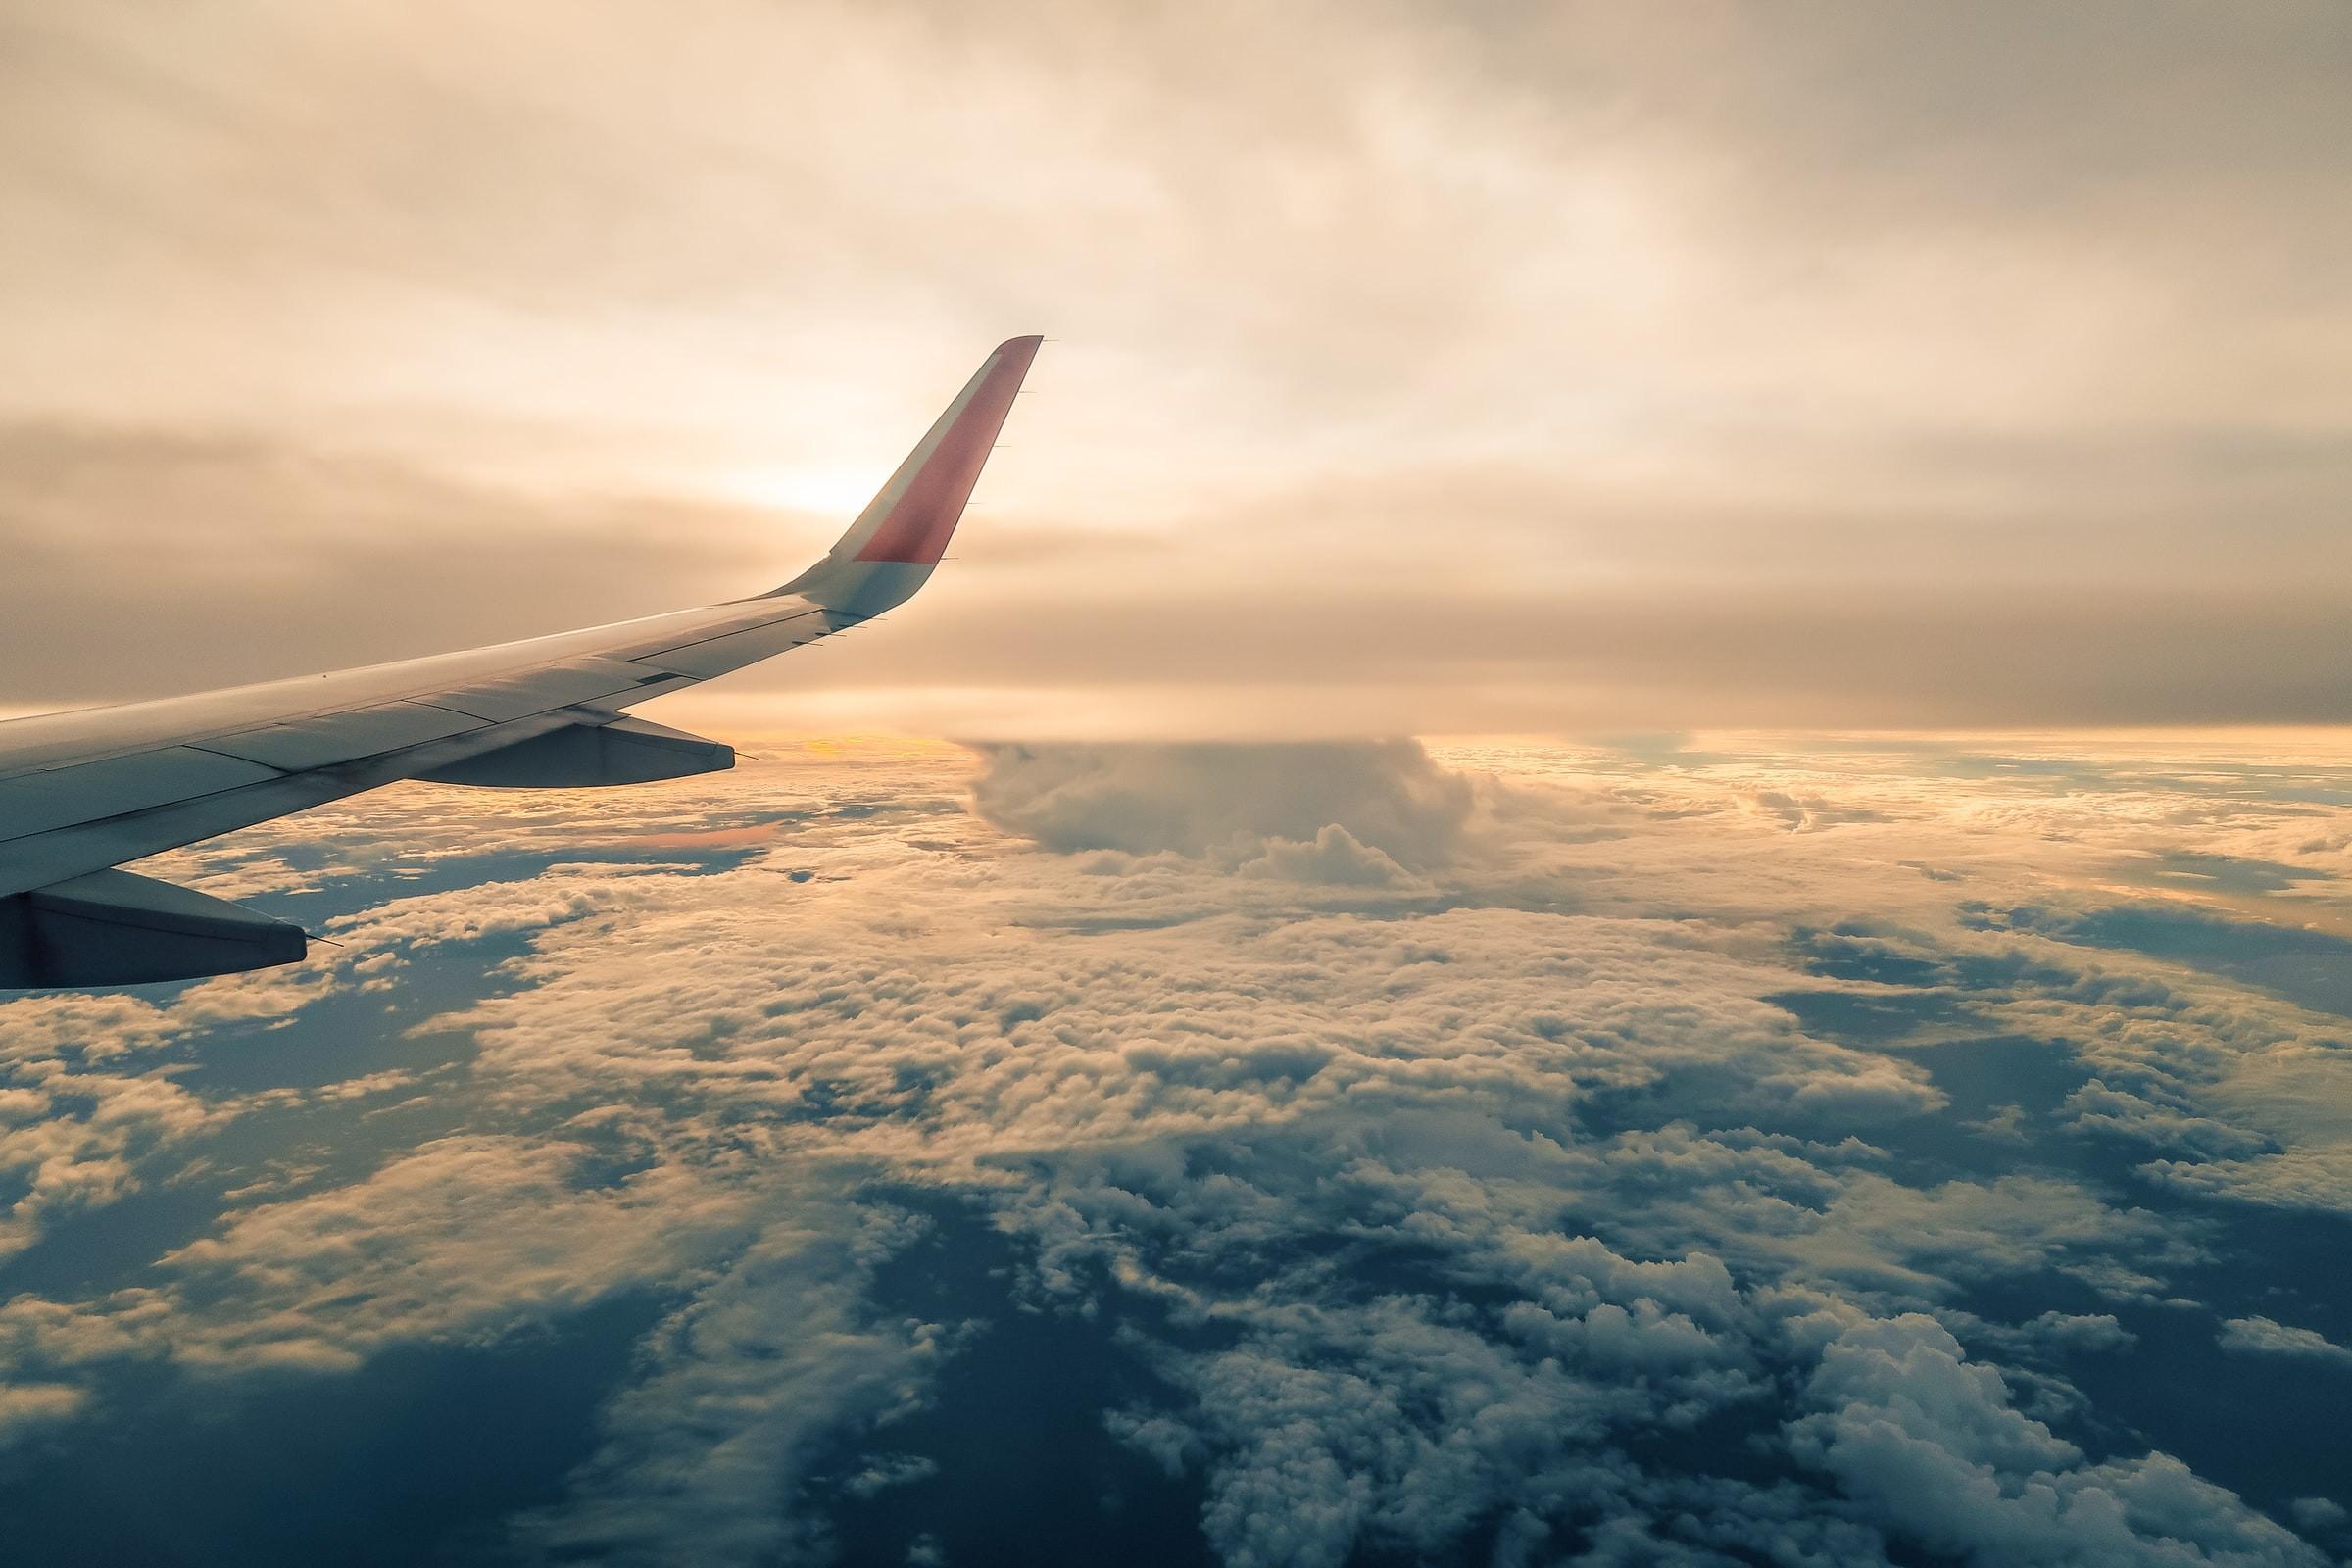 Flights Planes Tour Holiday Muslim Destinations